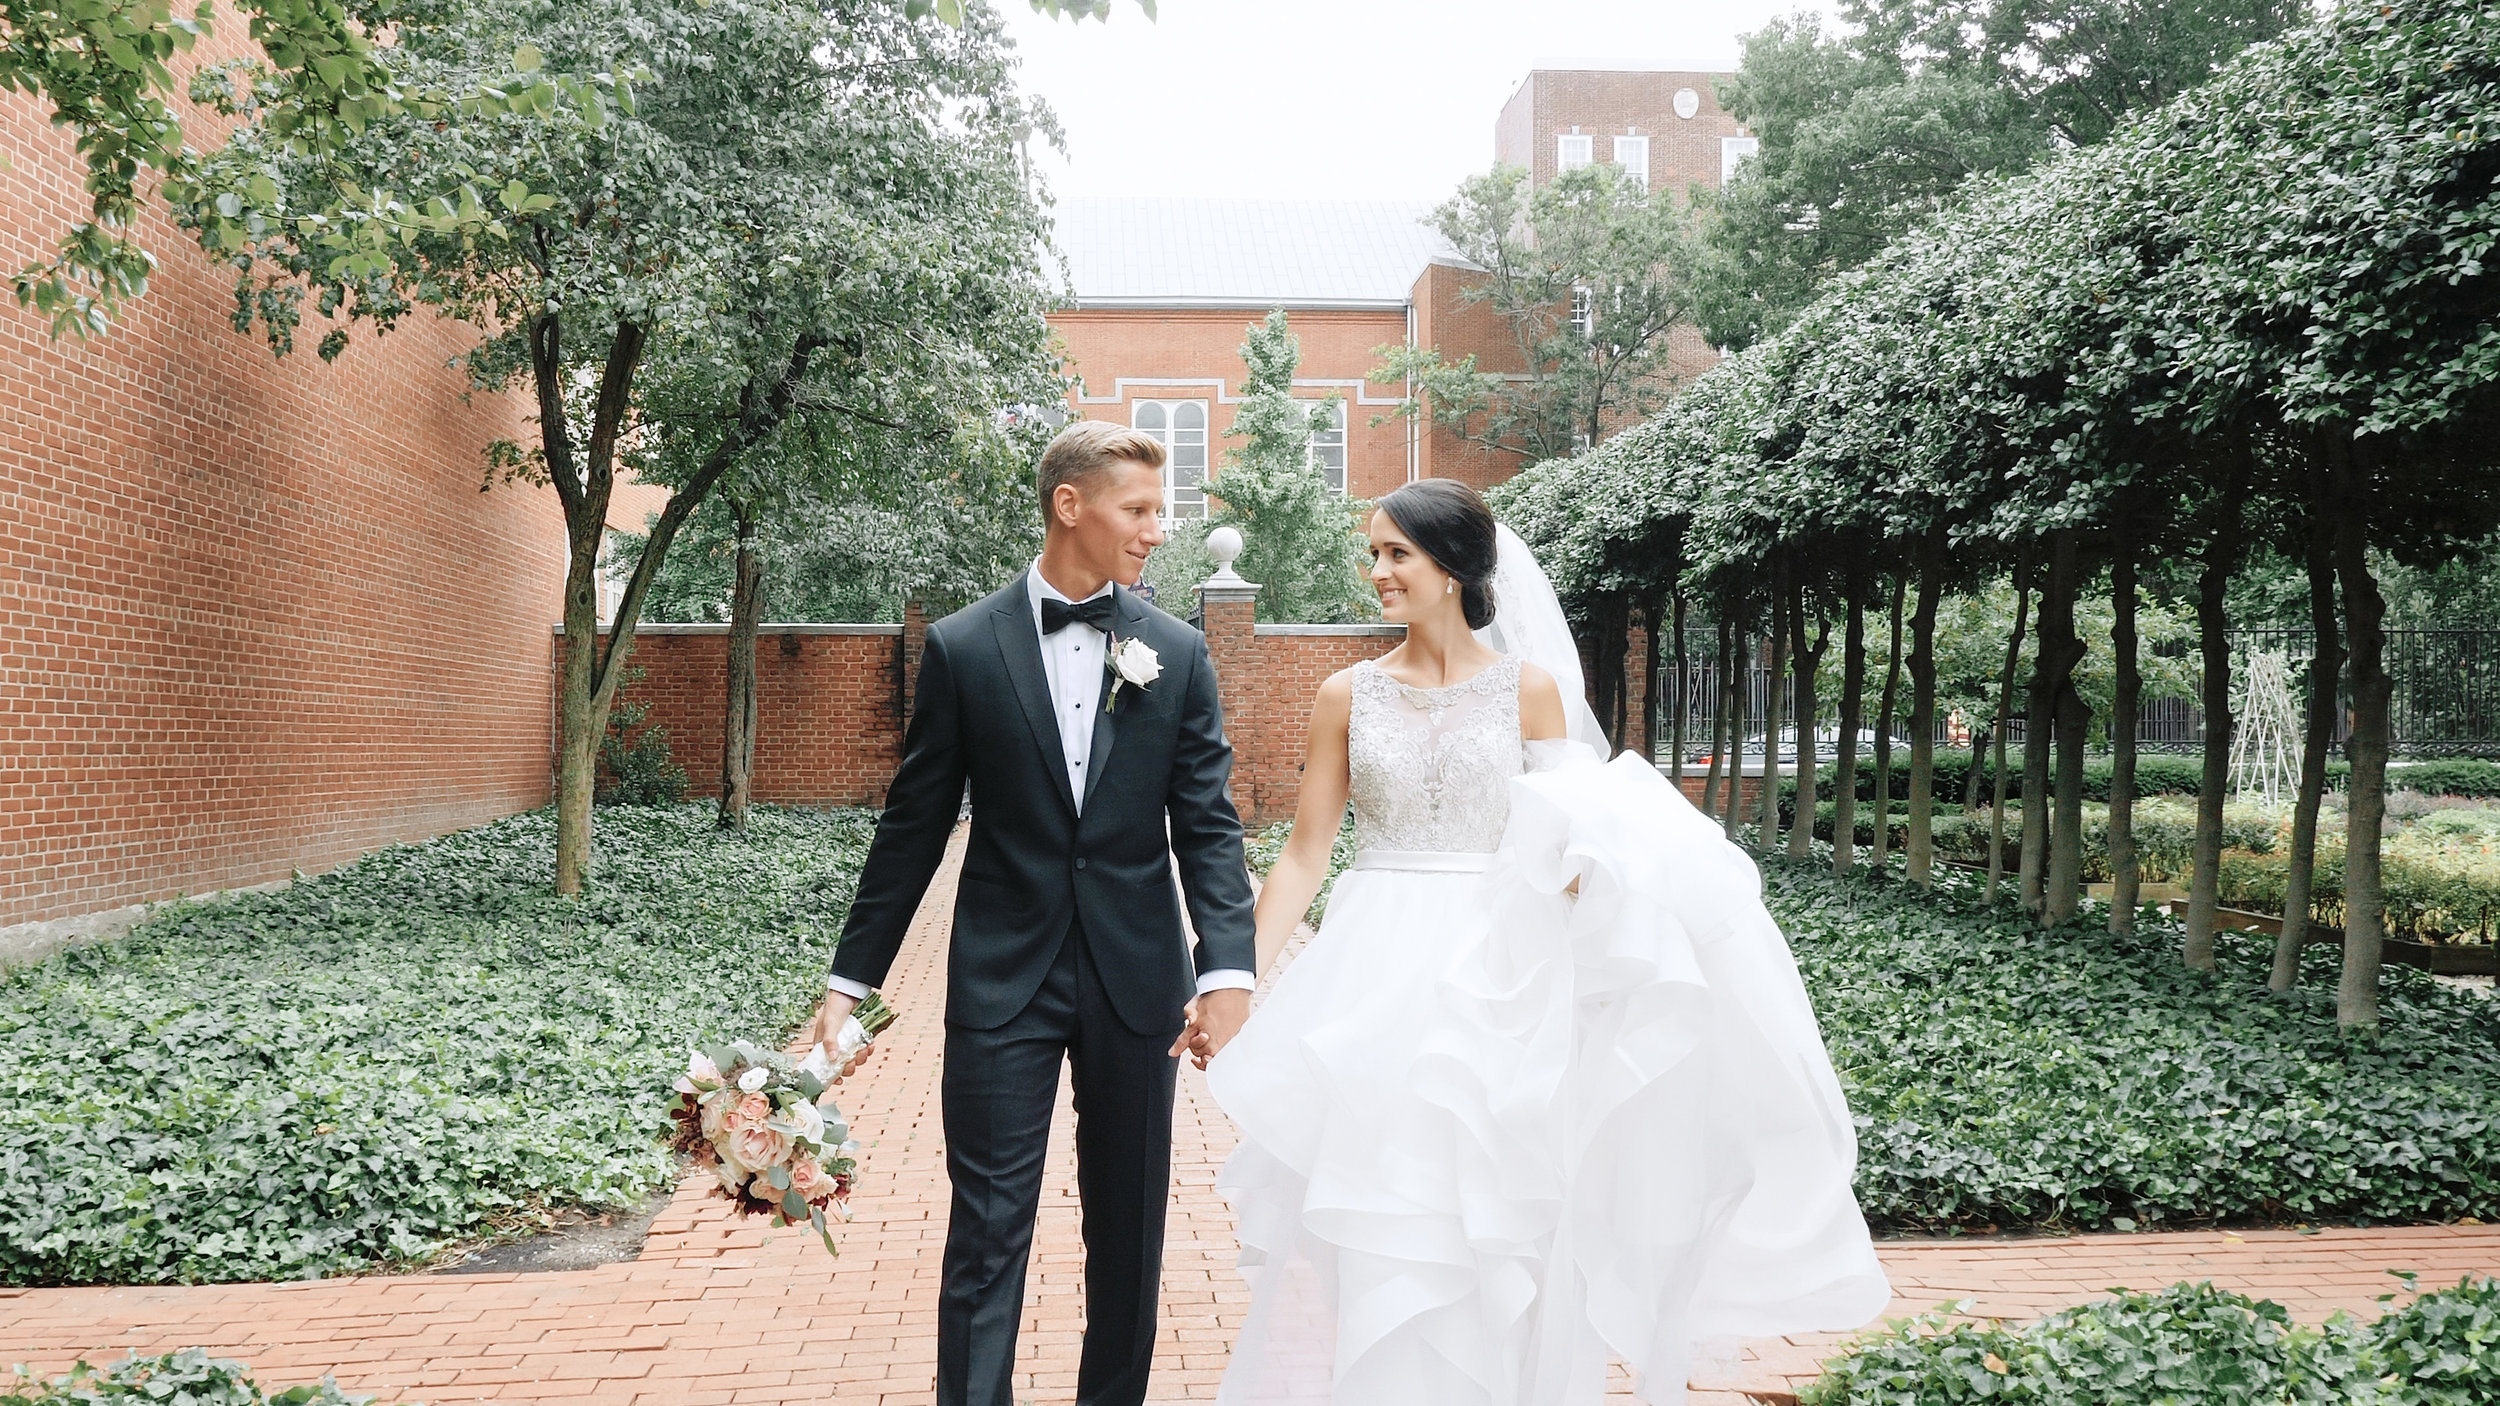 Tonemedia, NJ Wedding Videographer, NJ Wedding Videopgraphy, NJ Wedding Video, down town club philly, down town club wedding, philly wedding, cescaphe wedding